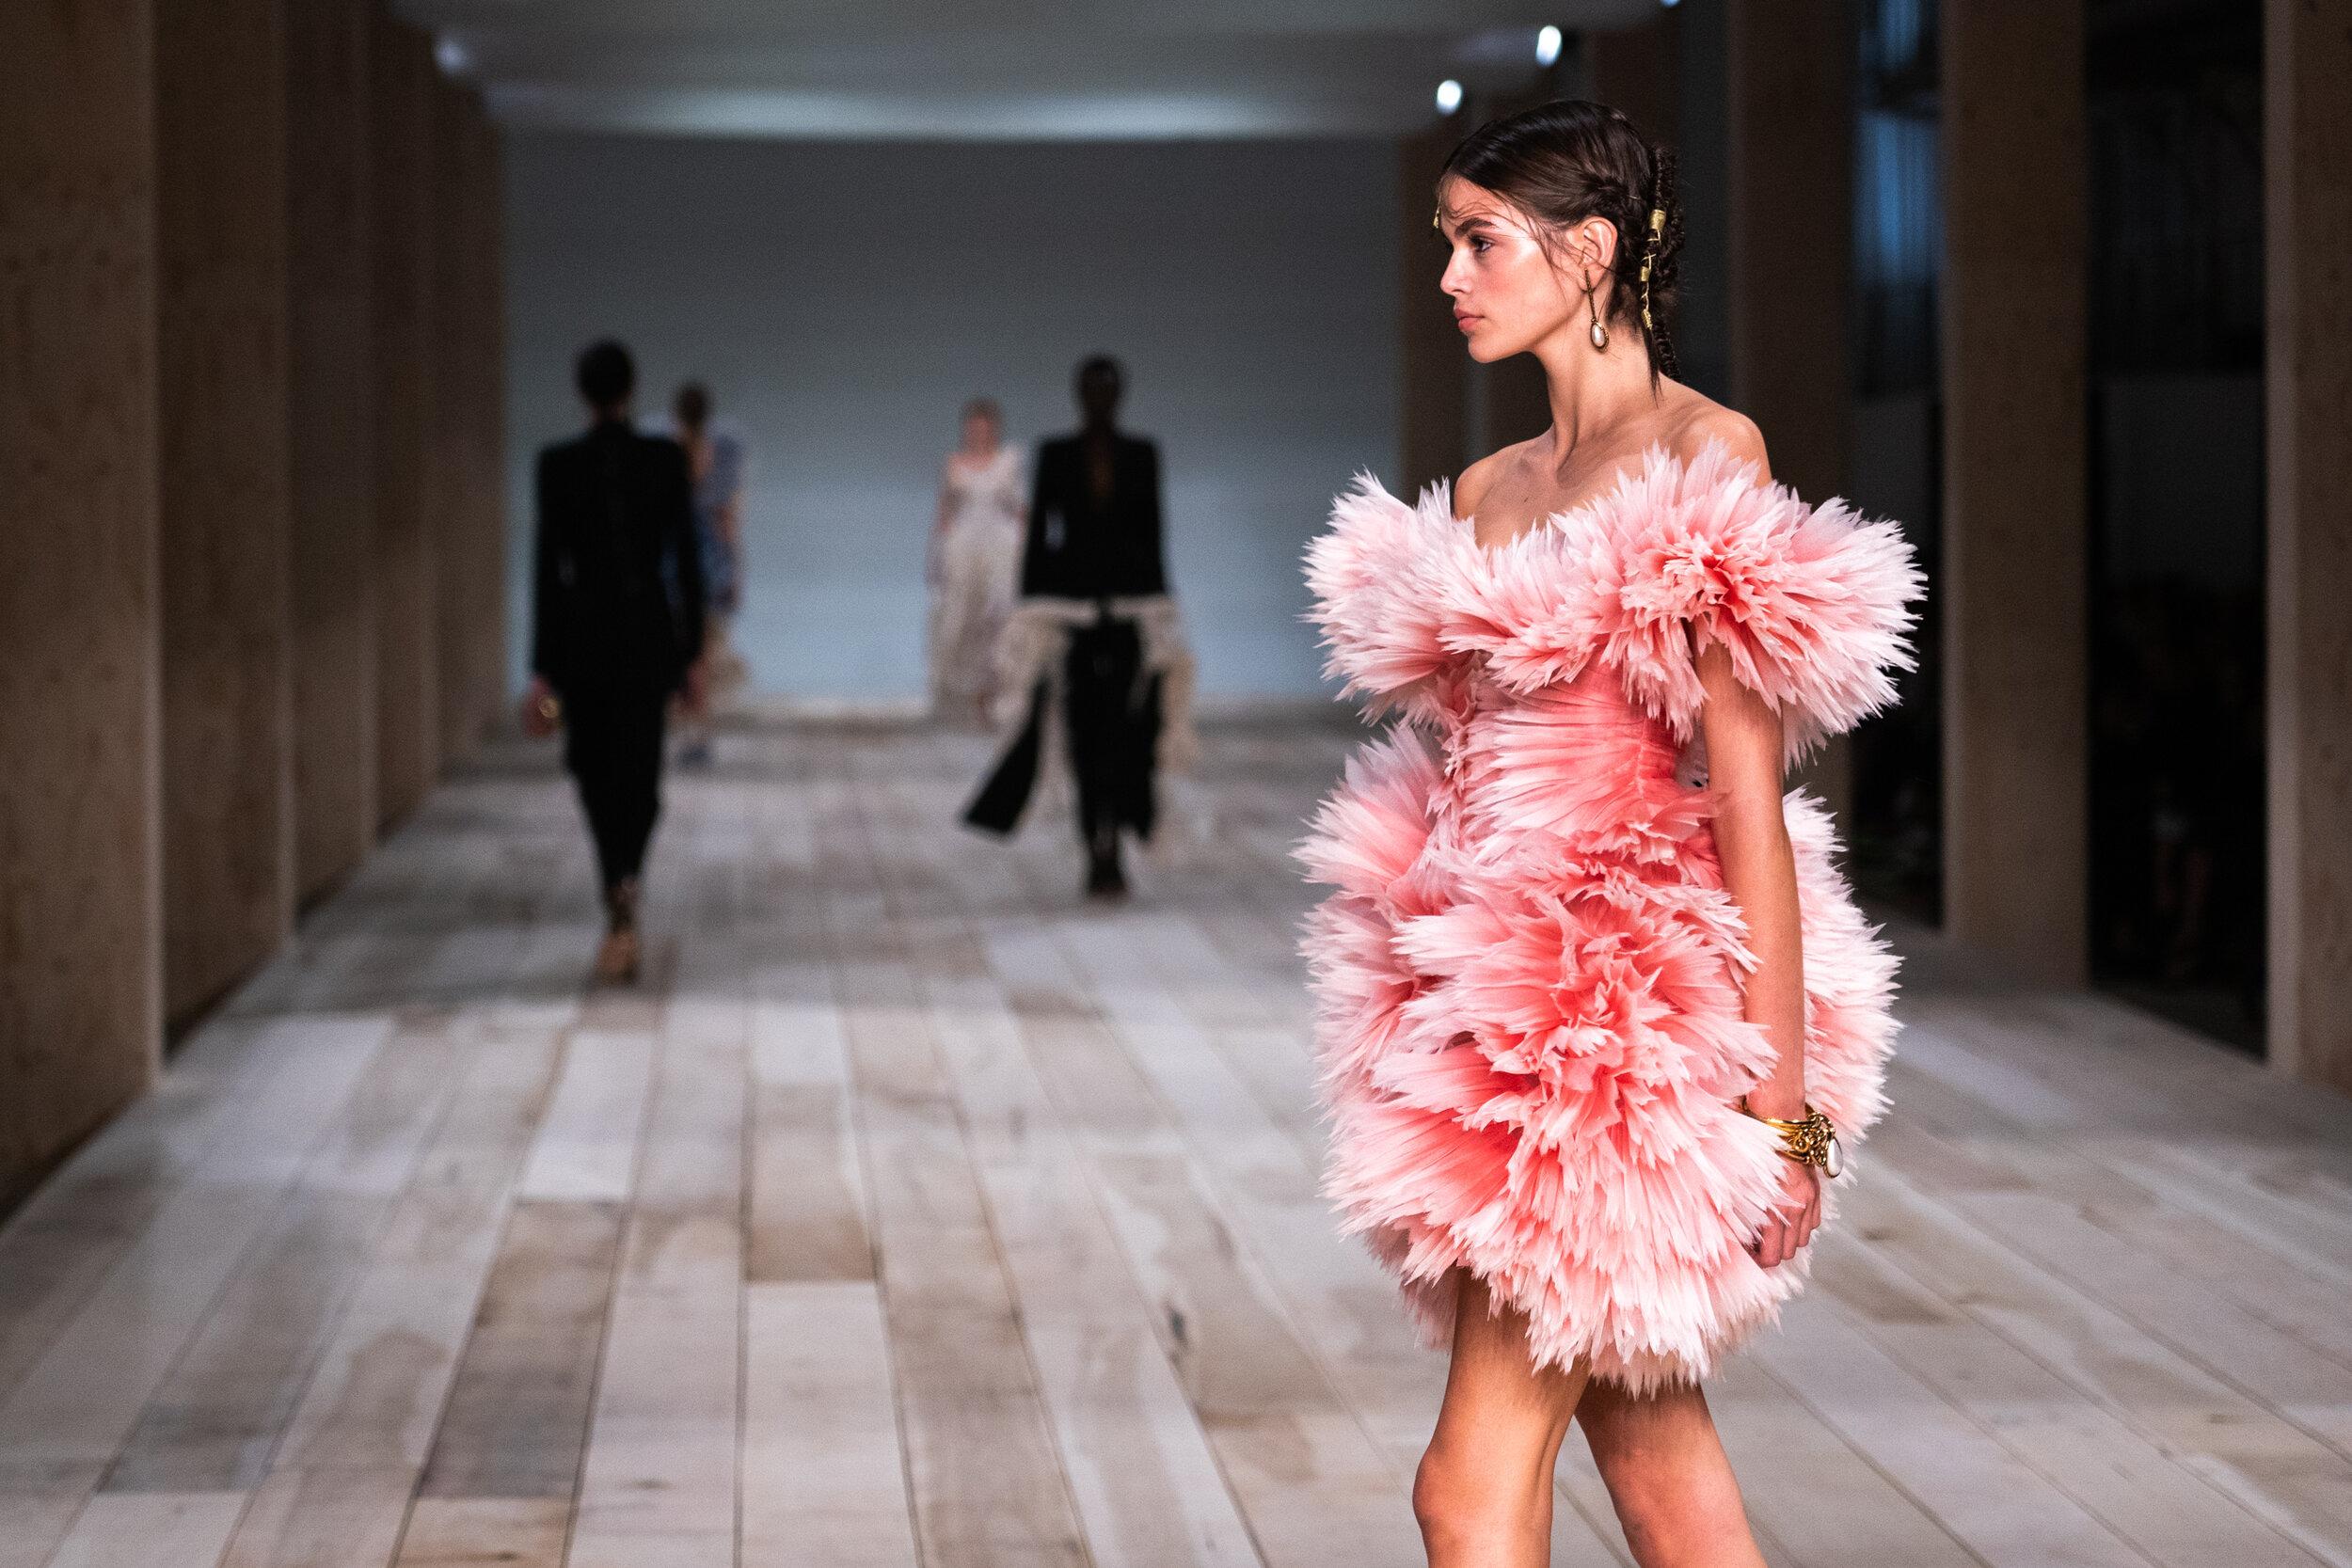 Kaia Gerber at Alexander McQueen at Paris Fashion Week. (Photo: theimpression.com)